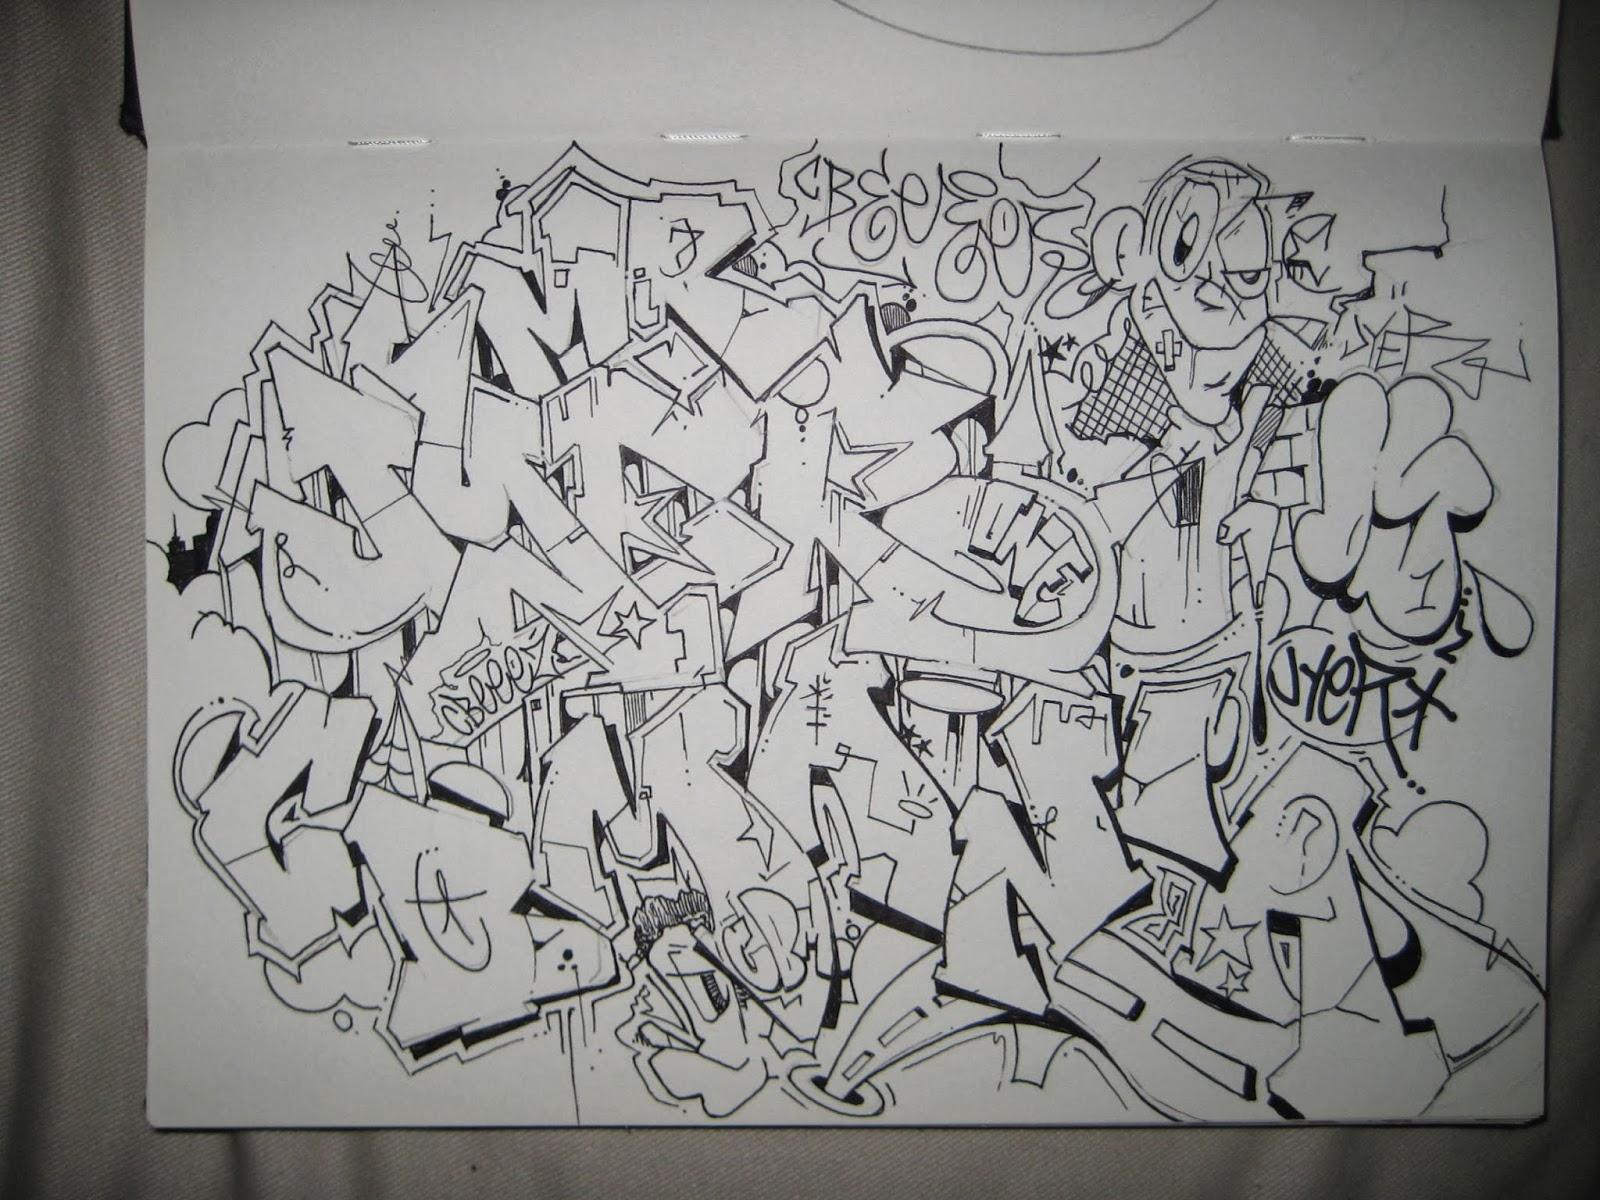 Graffiti creator font flava, digital image editor software  Graffiti Alphabet Flava